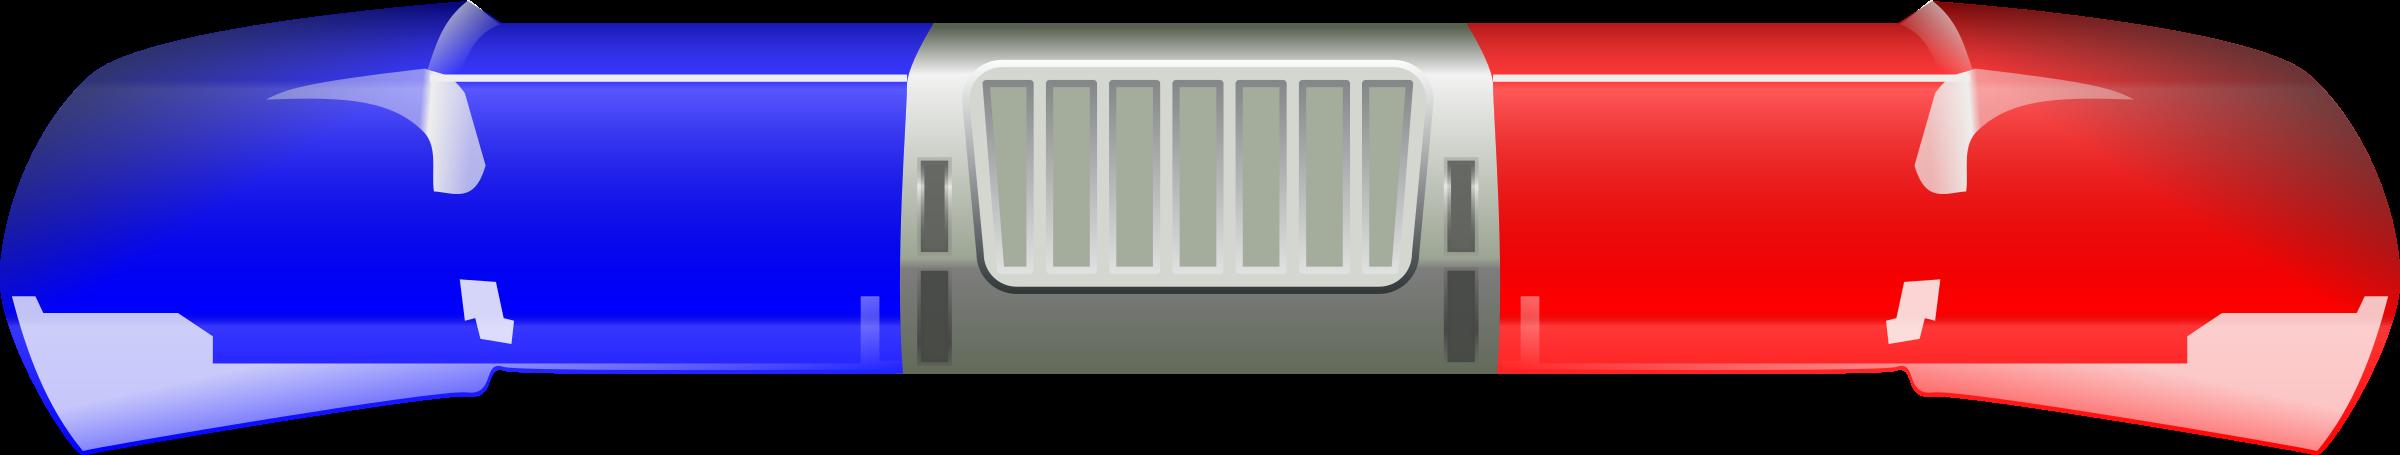 Jeep Clipart Headlights Jeep Headlights Transparent Free